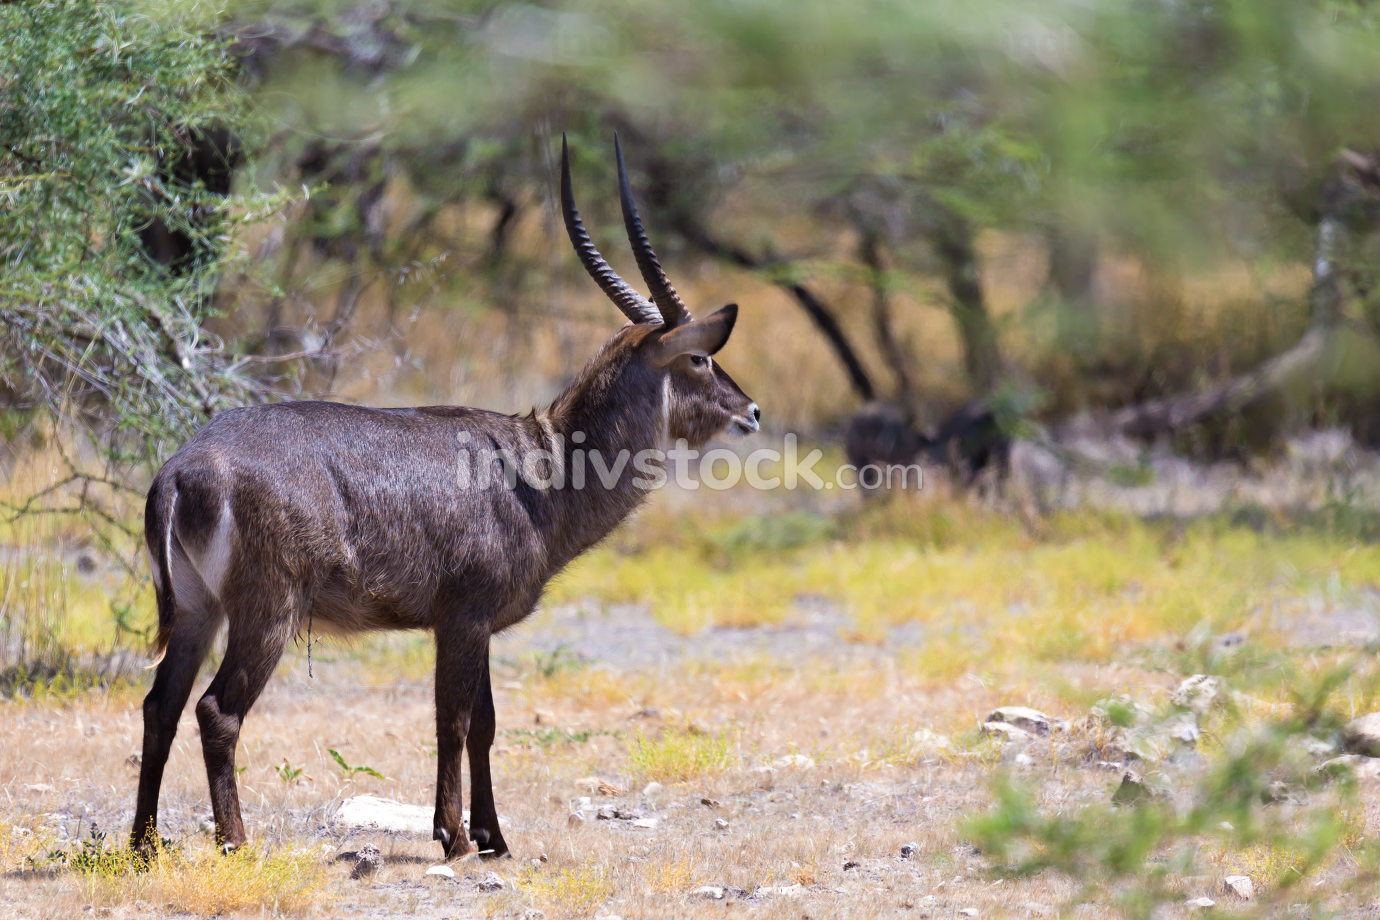 Antelope in the middle of the savannah of Kenya